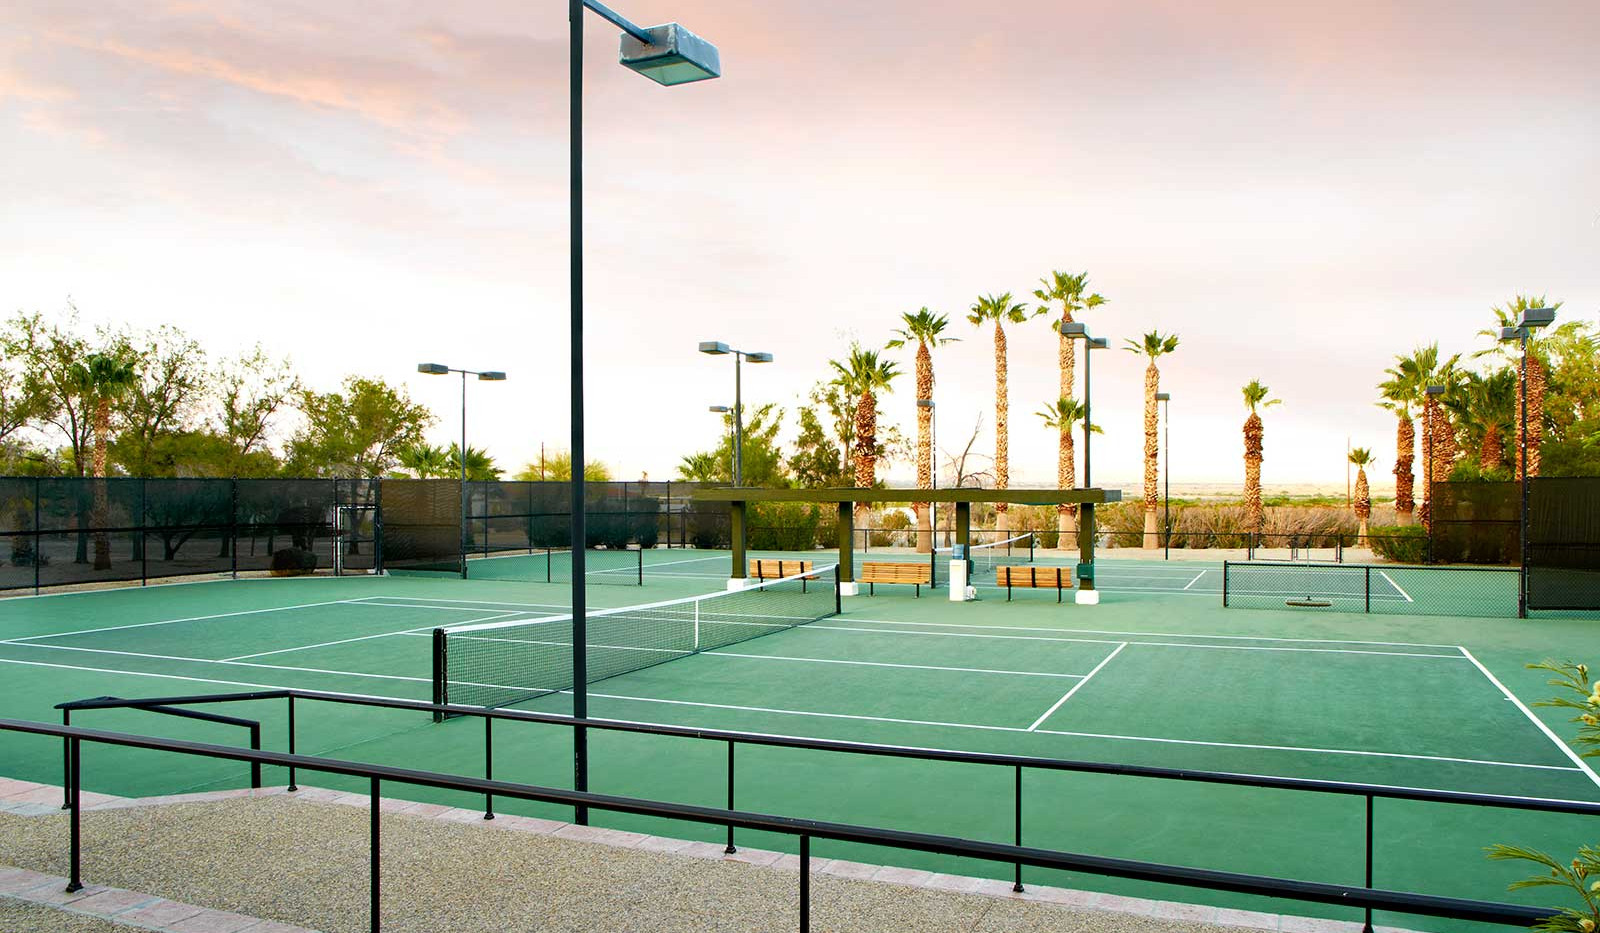 La Casa's tennis courts